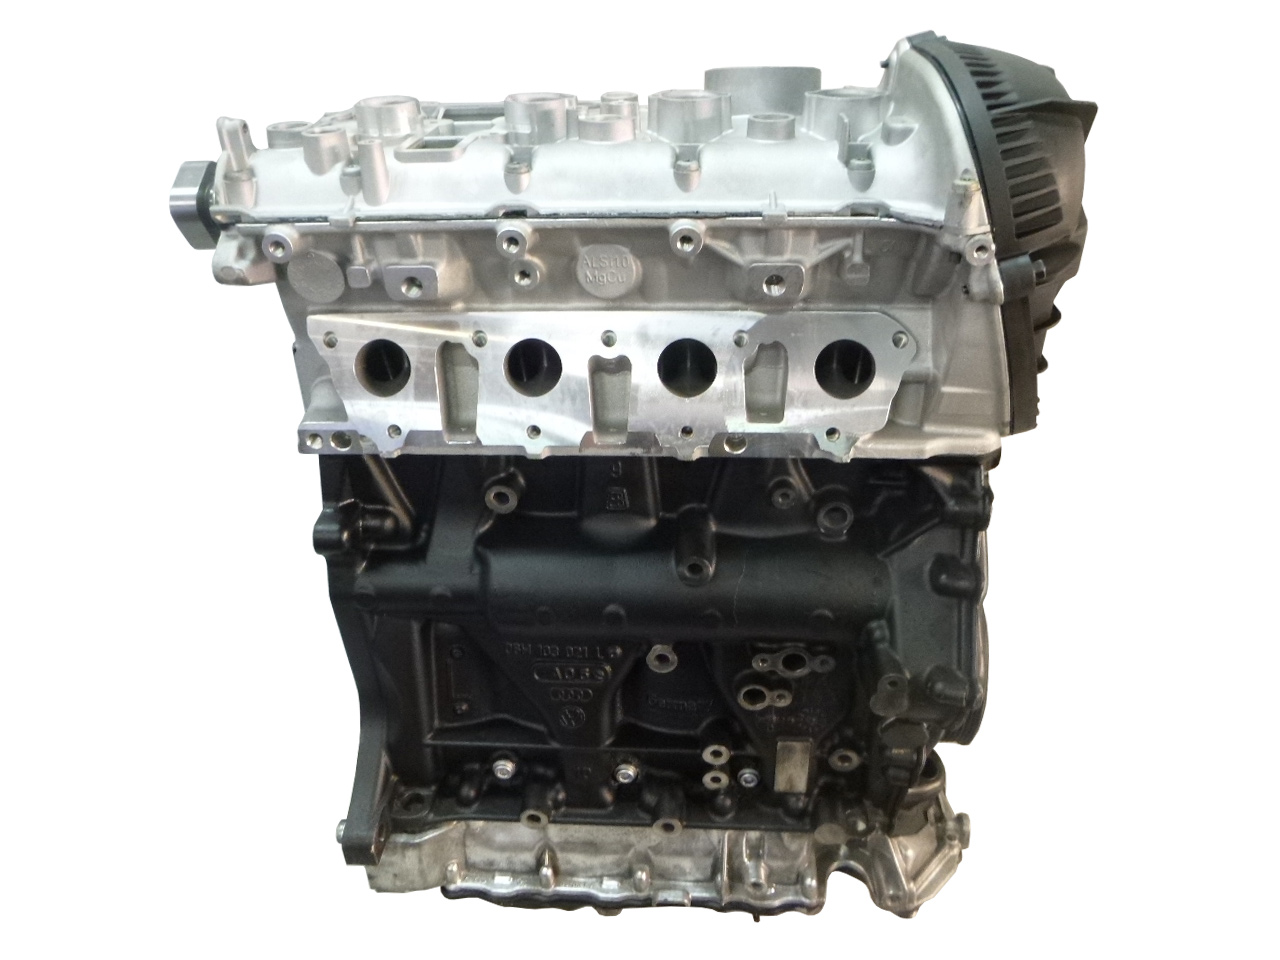 Motor Überholung Instandsetzung Reparatur VW Audi Skoda 1,8 TSI TFSI BZB BYT BYJ